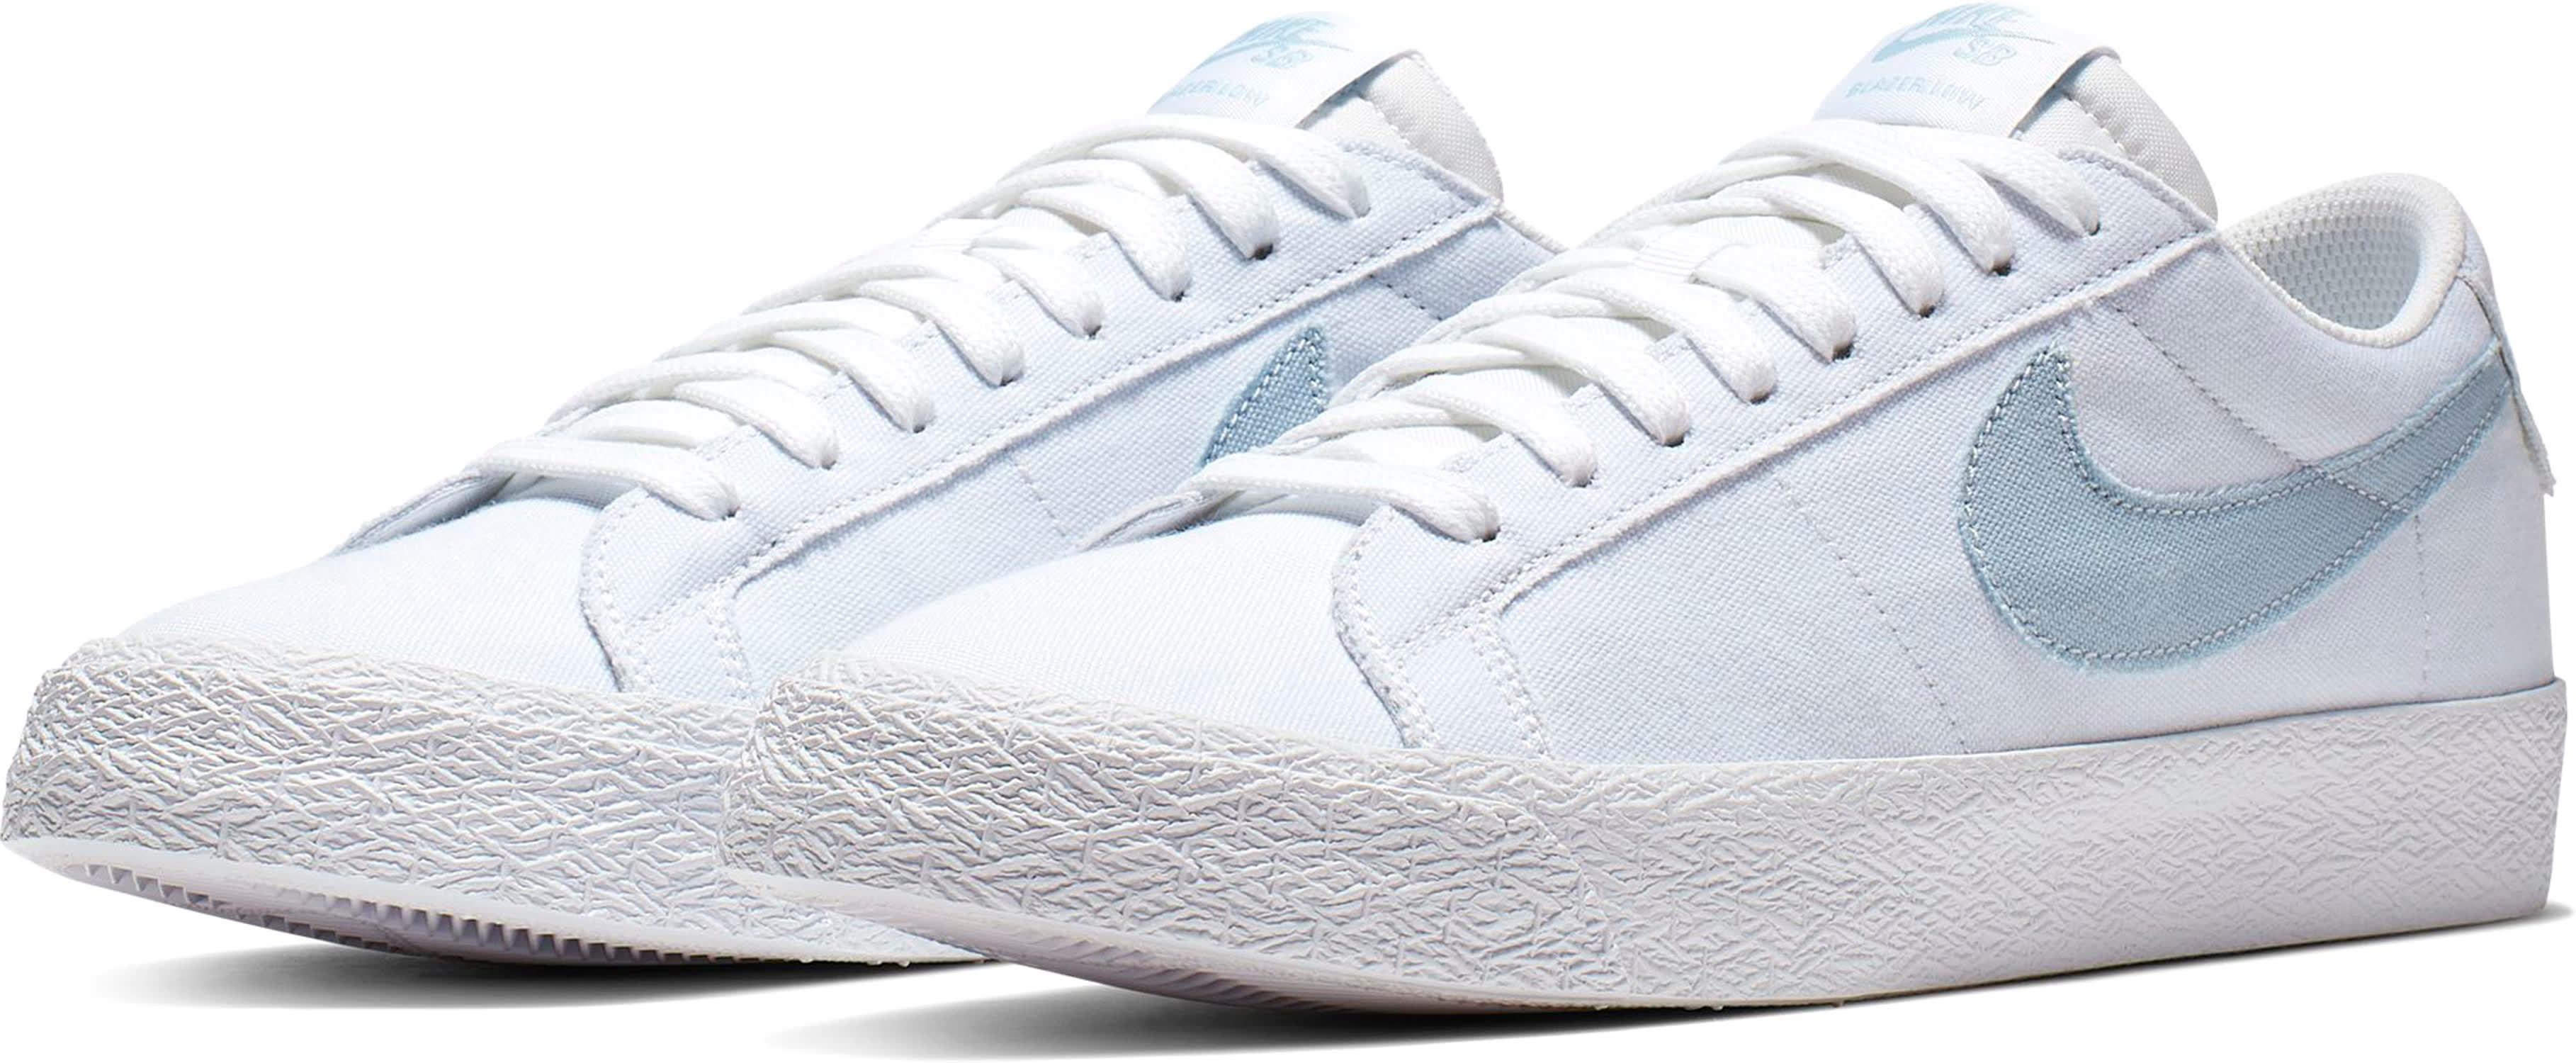 dc66842ee98c6 Nike SB Air Zoom Blazer Low Canvas Skate Shoes - thumbnail 3